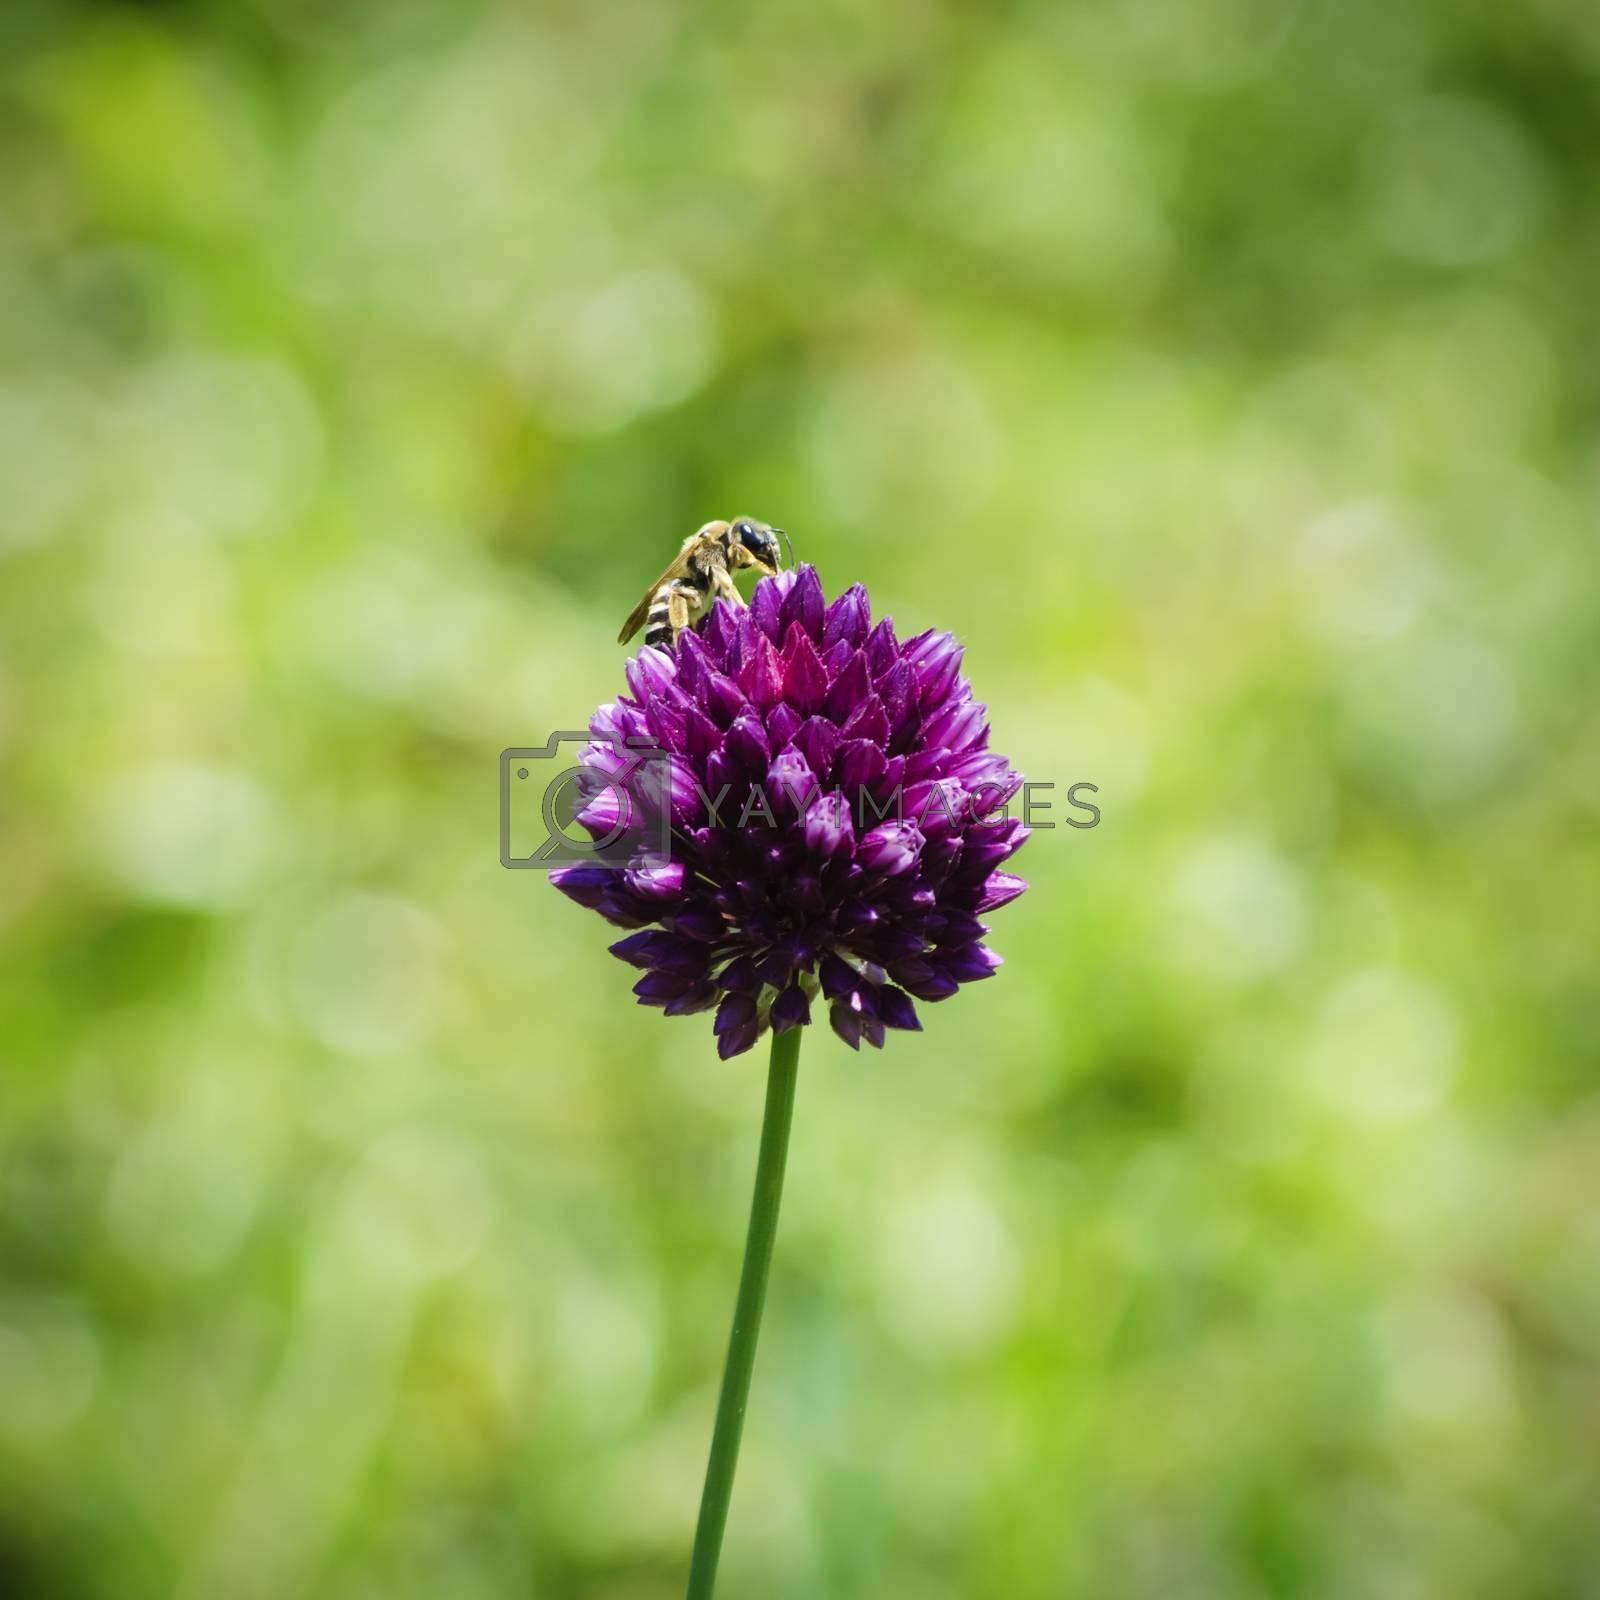 Clover Flower and Bee by razvodovska